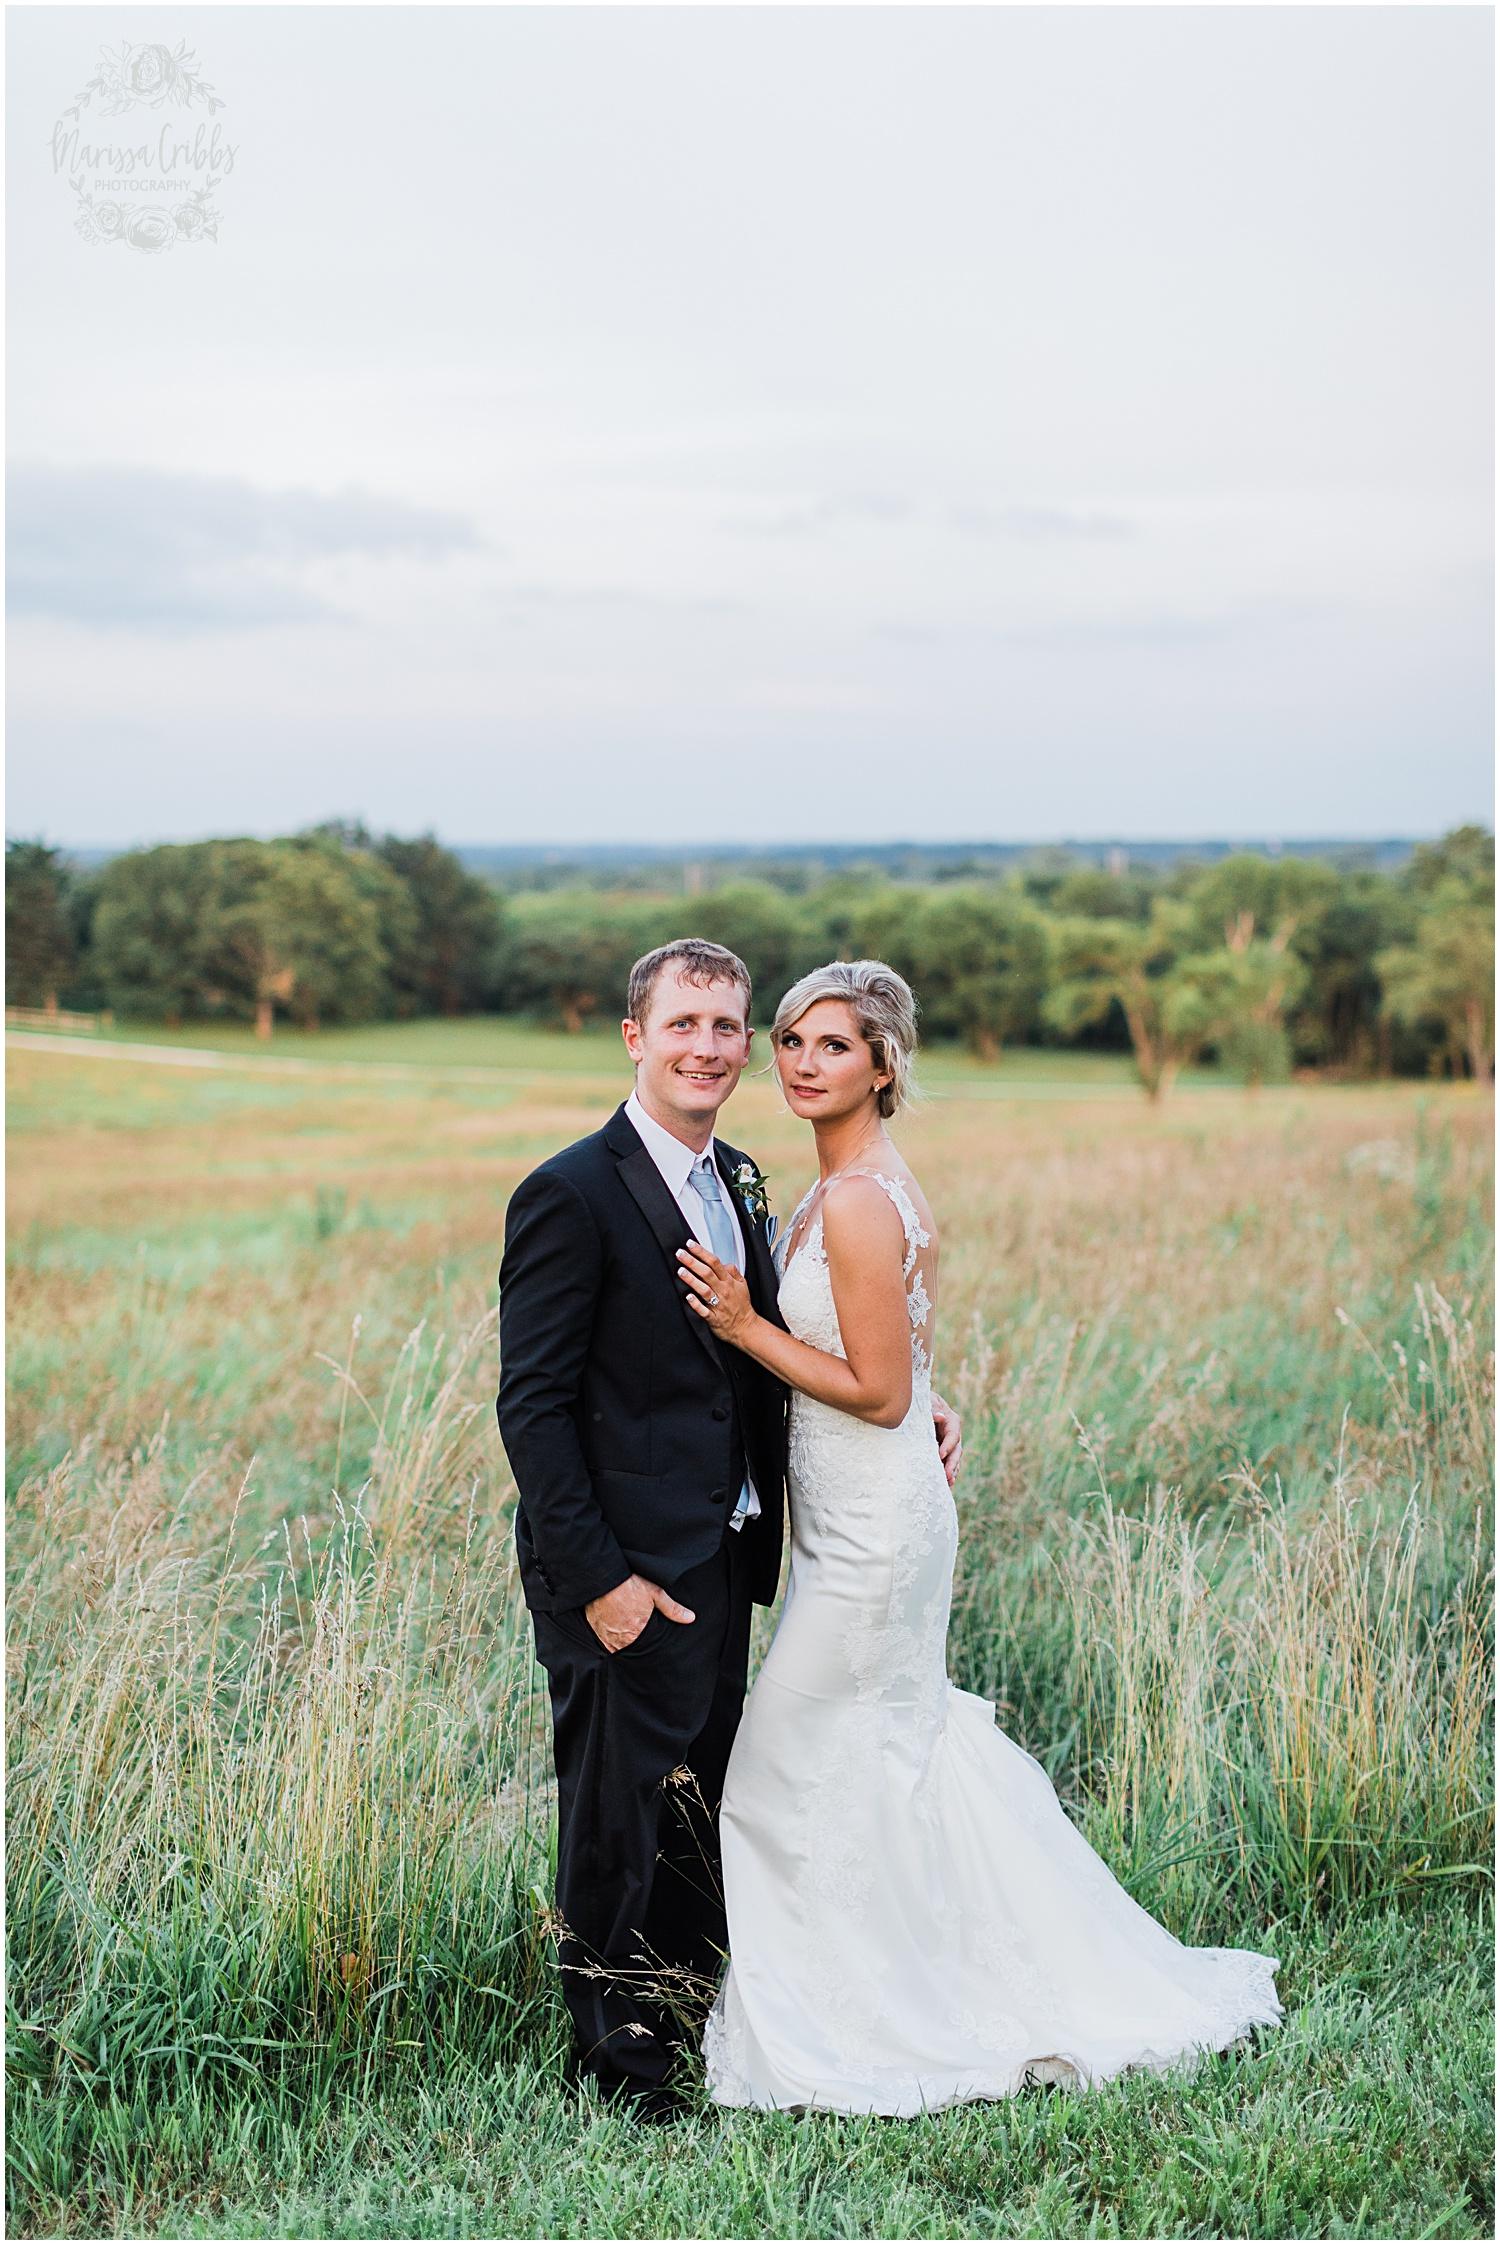 CHELSEA & BEN MARRIED BLOG  | MARISSA CRIBBS PHOTOGRAPHY_8641.jpg